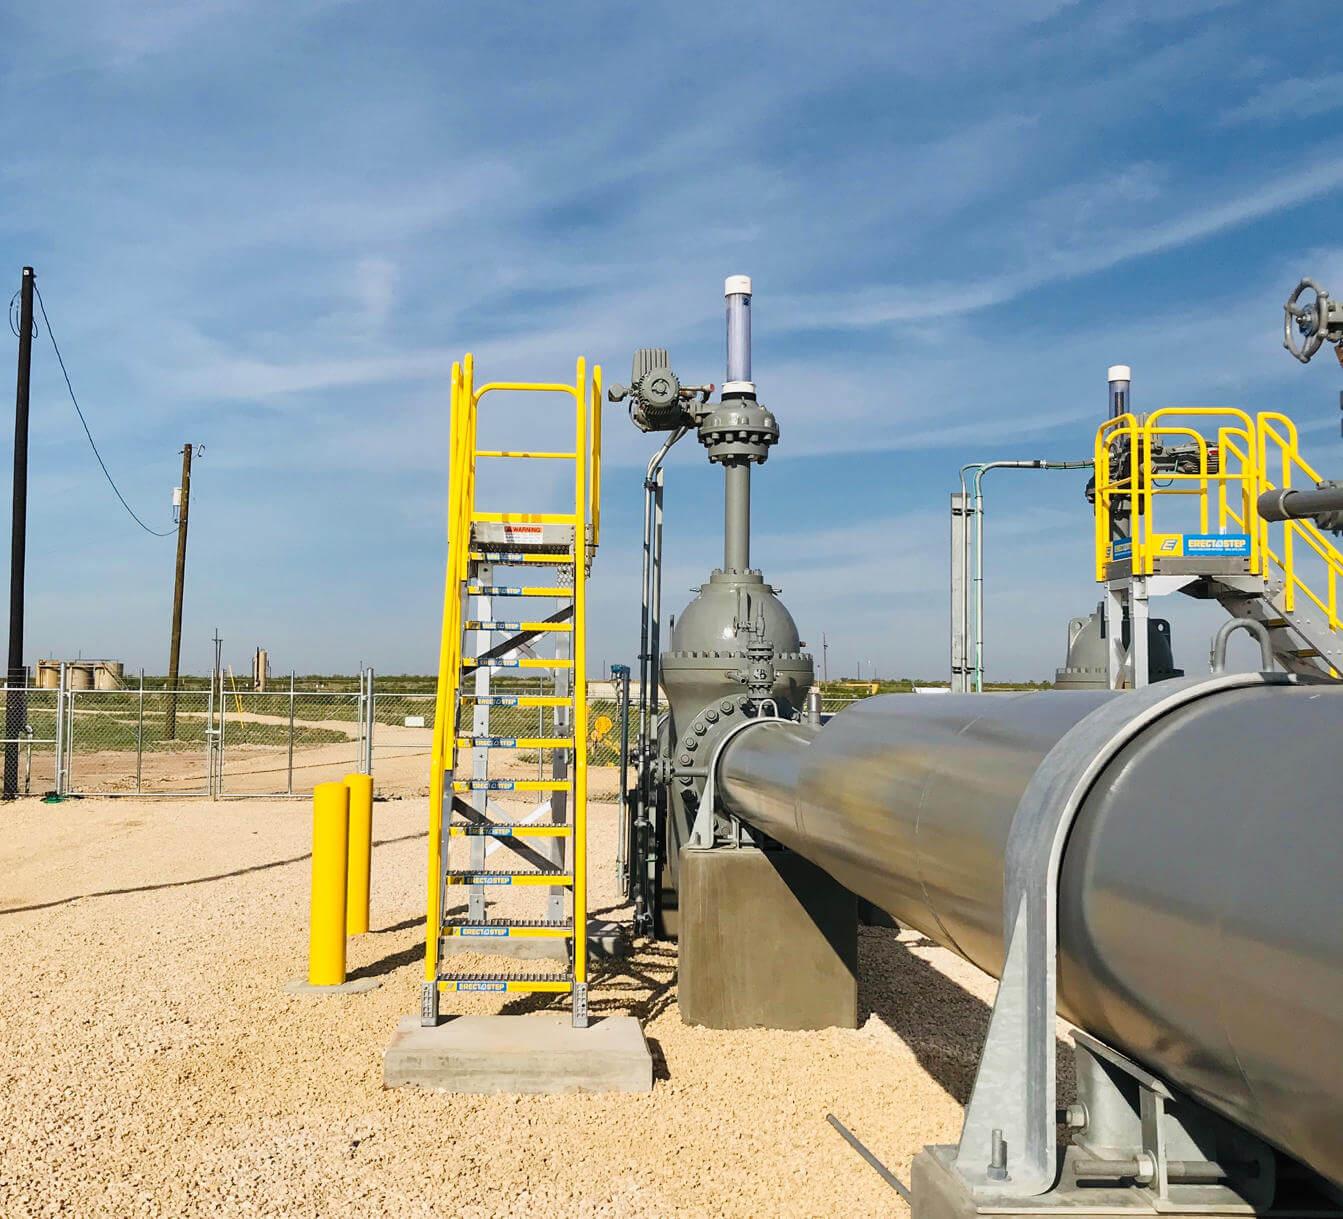 Metal platform installation to access pipeline valve